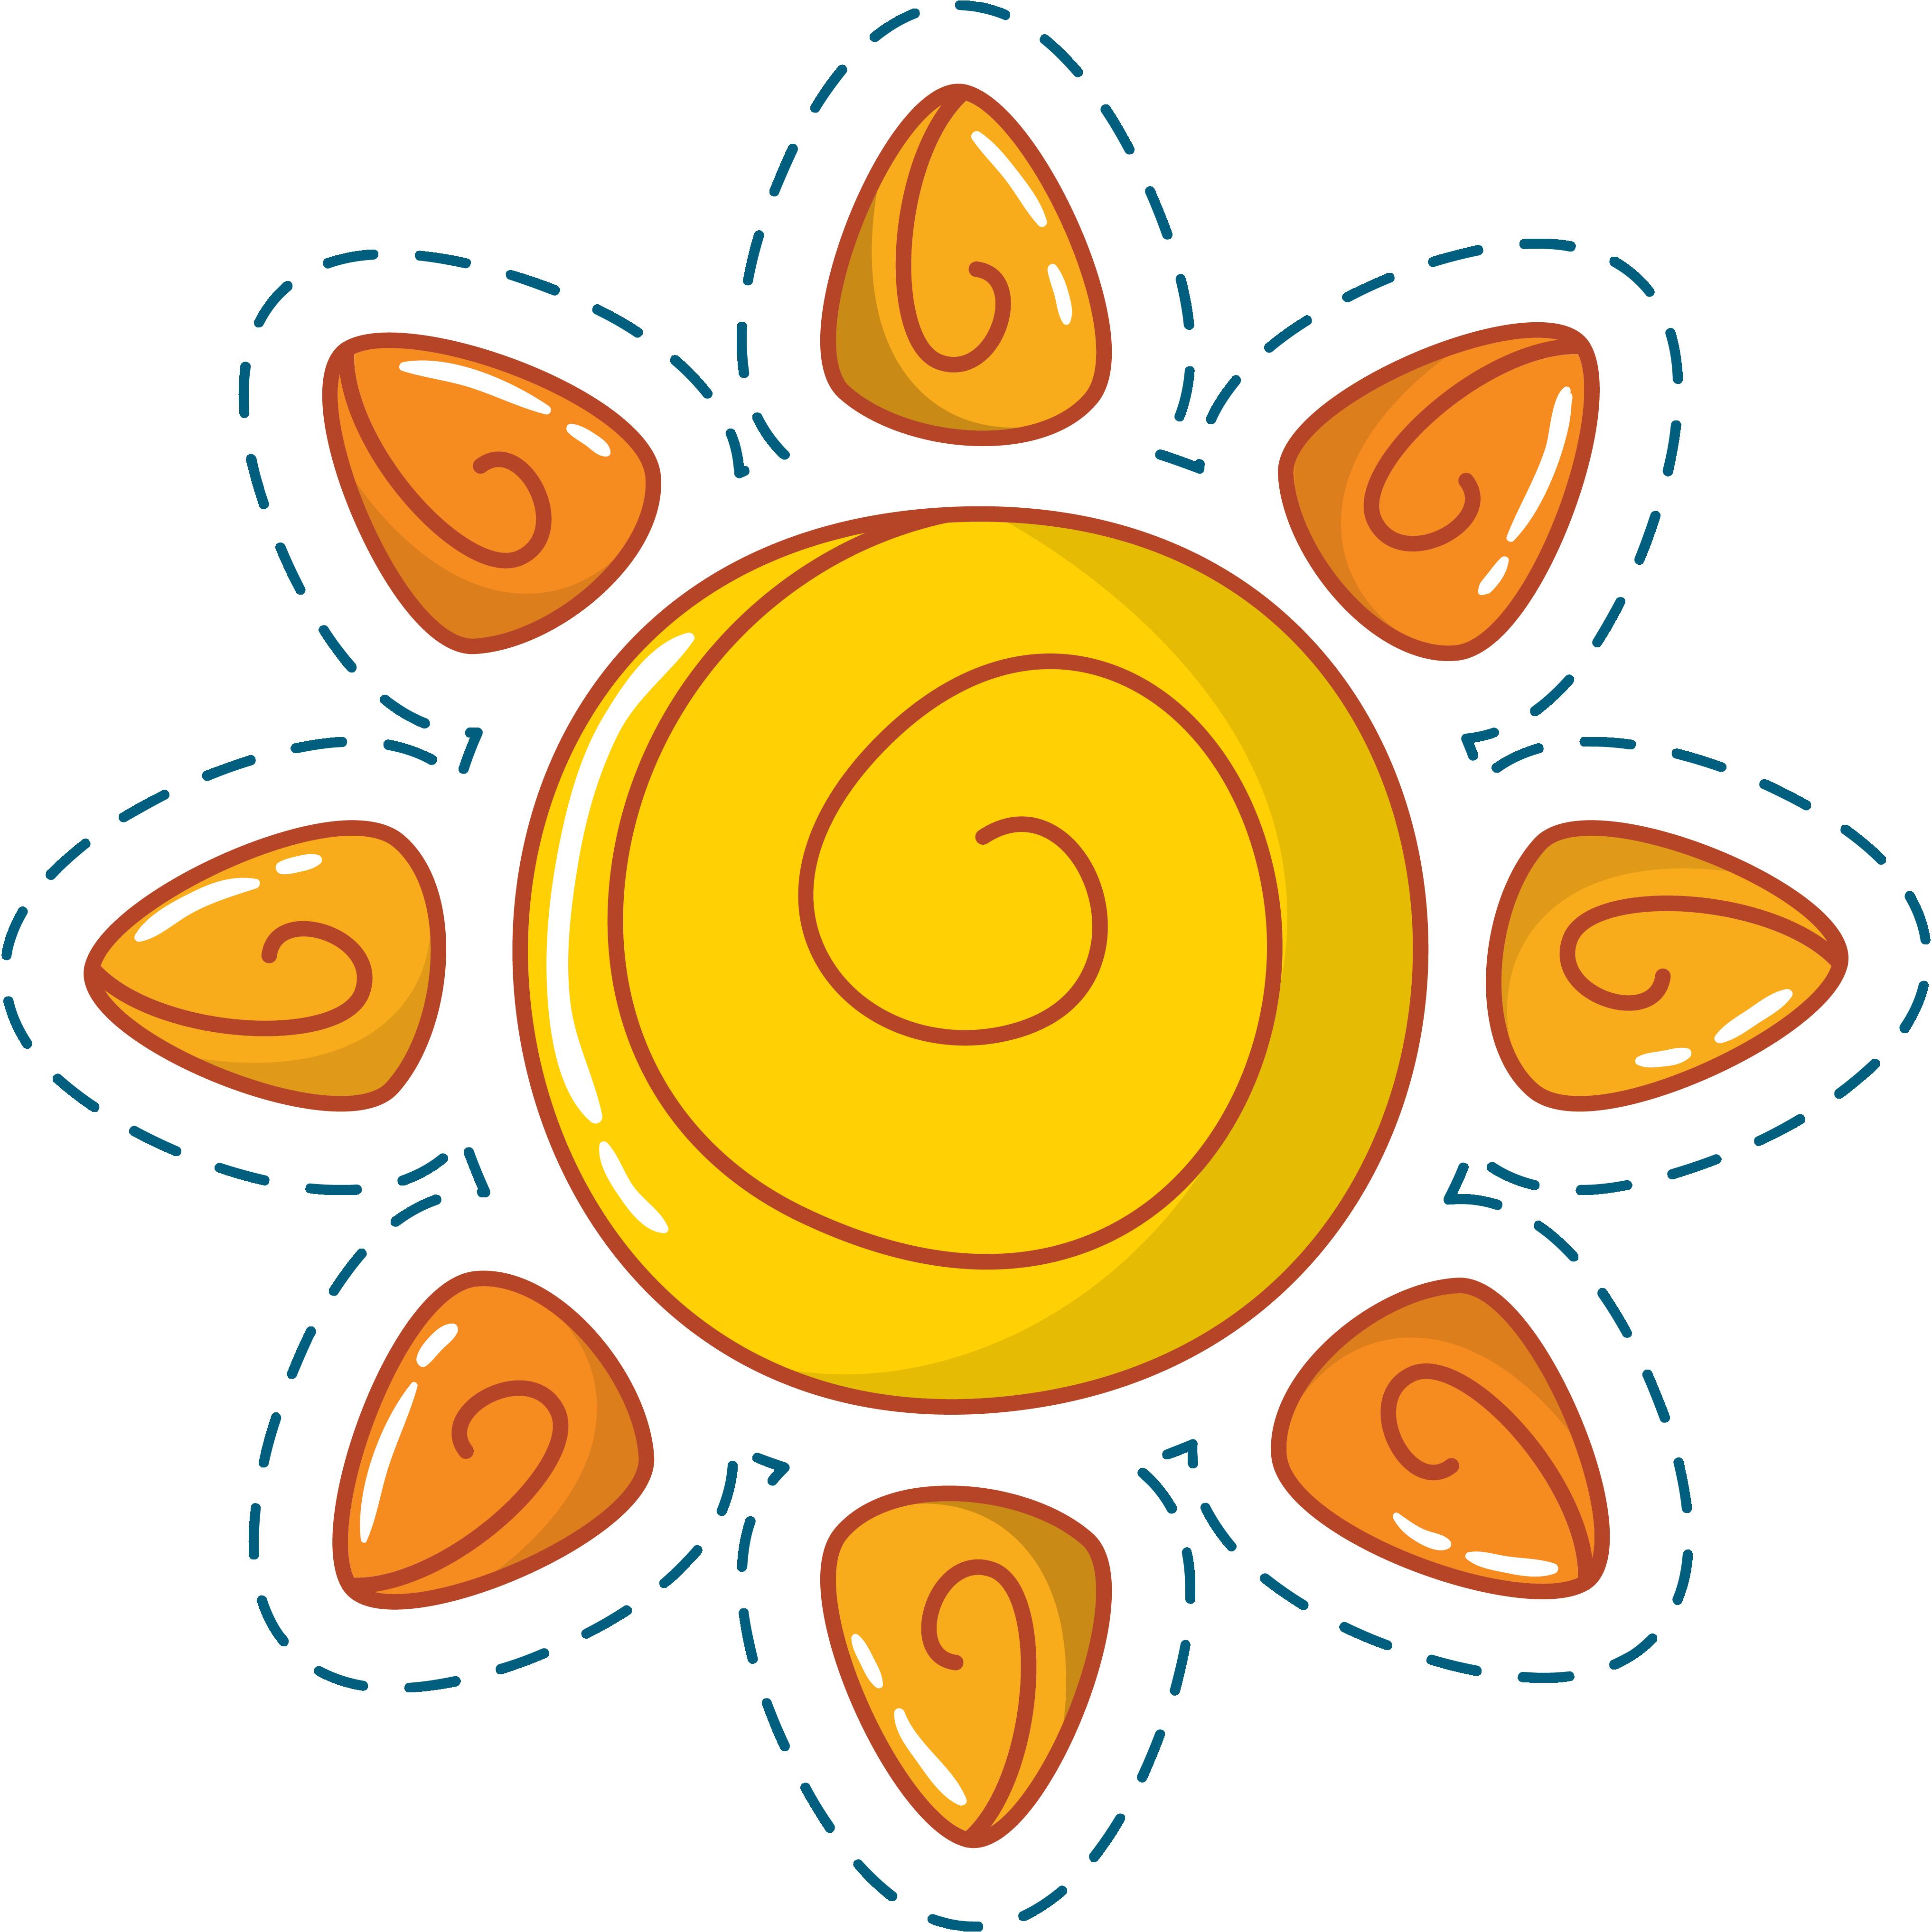 Free sun download artwork clipart jpg library download Cartoon Clip art - Cute cartoon sun 4070*4071 transprent Png Free ... jpg library download